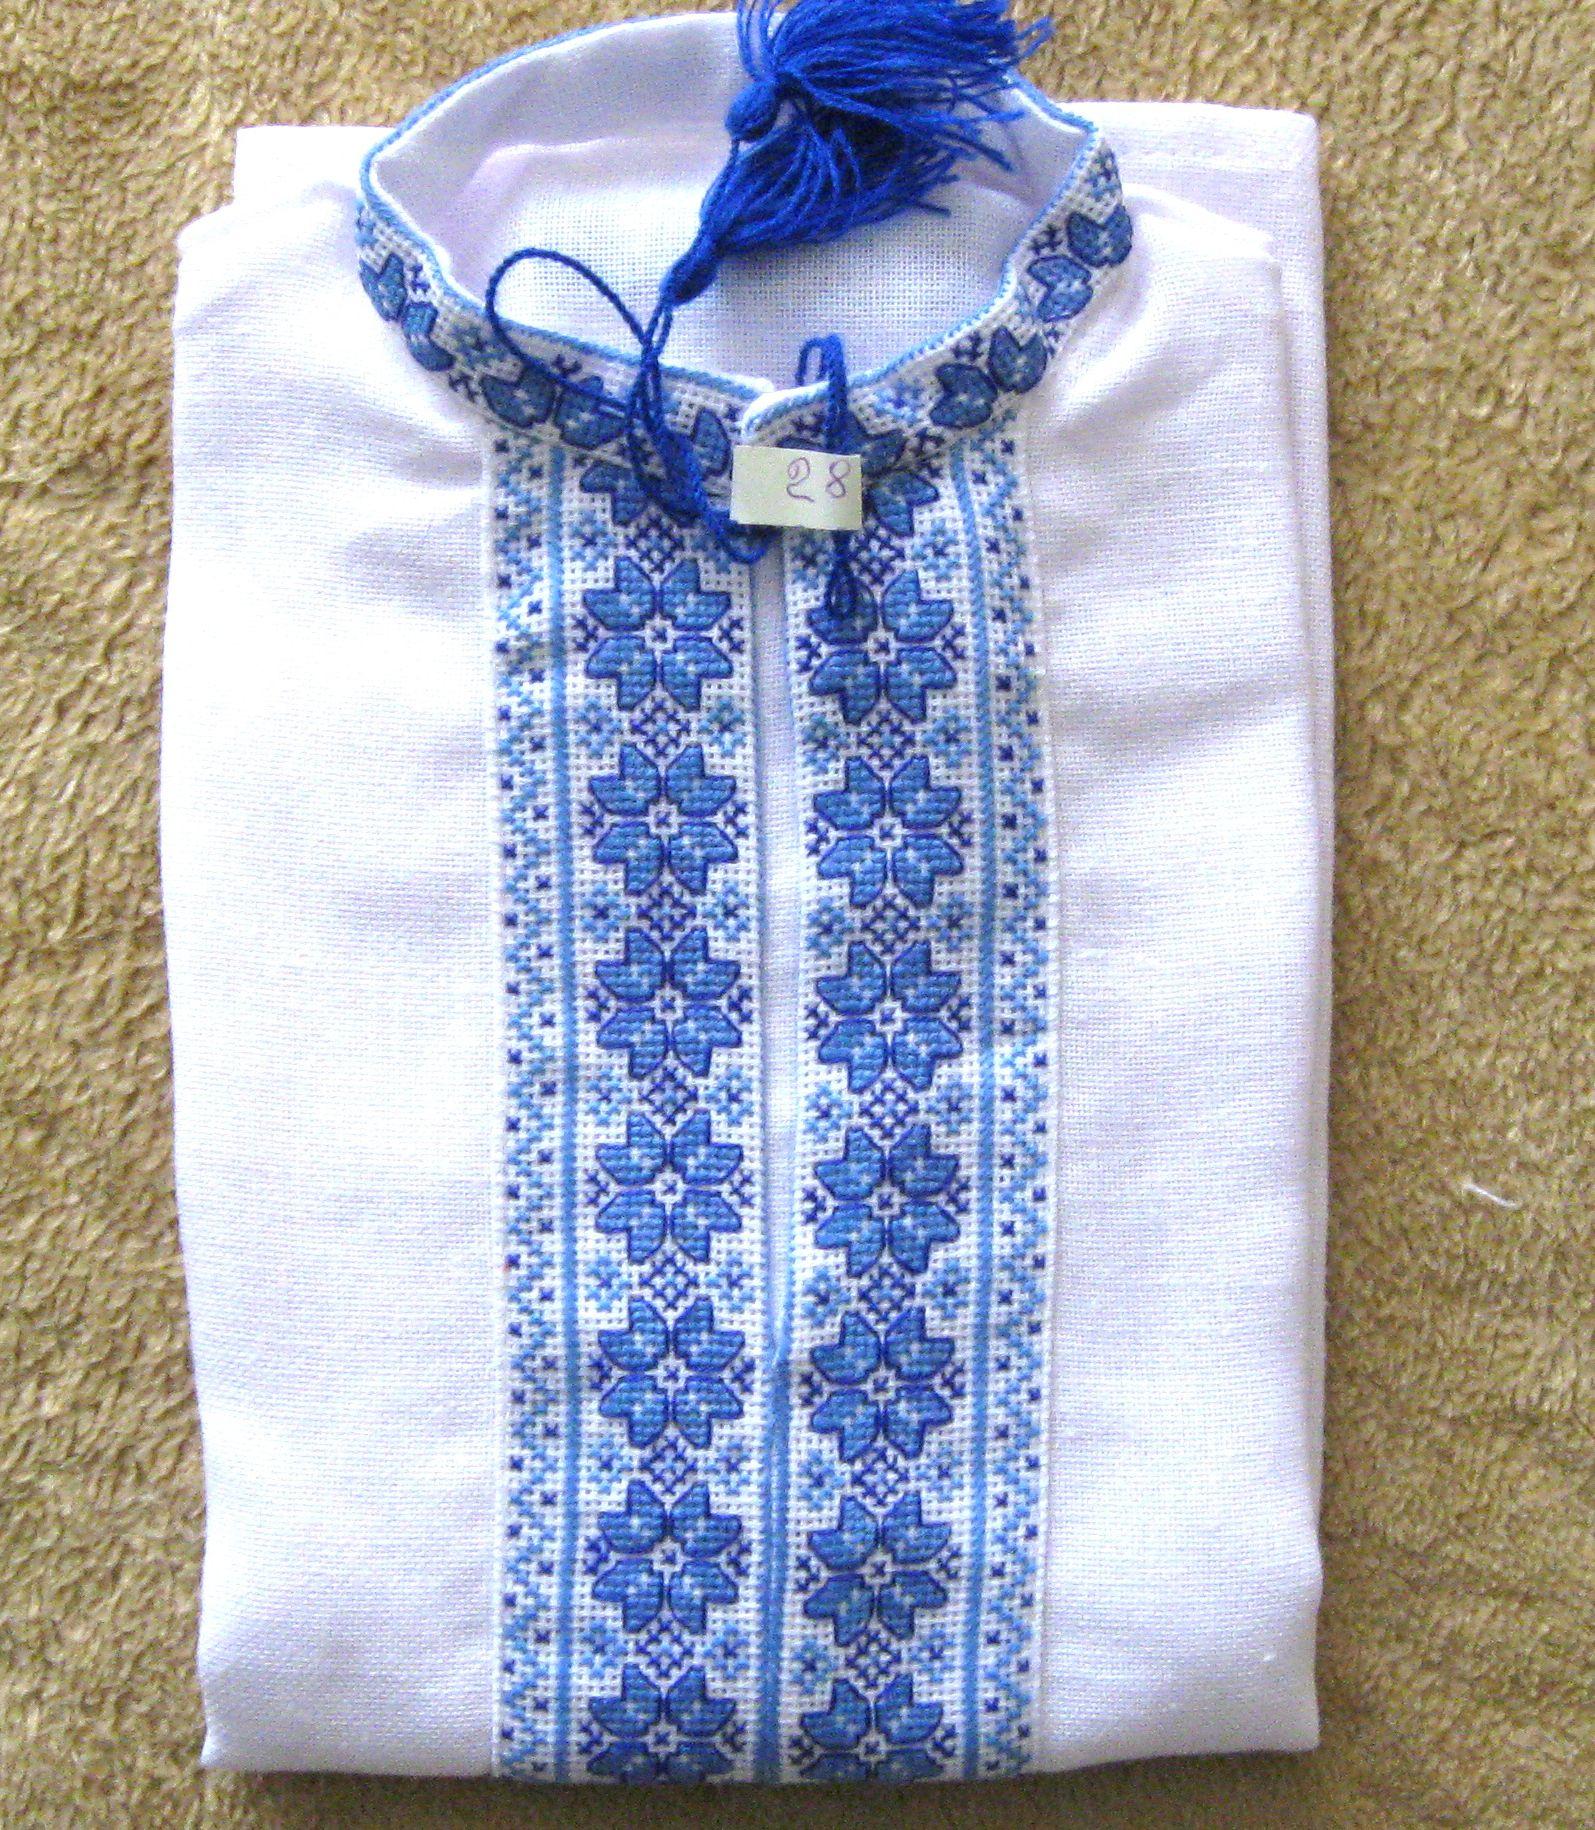 Вишиванка для хлопчика з голубим орнаментом - Фотогалерея ... bf19a27ddf9ec